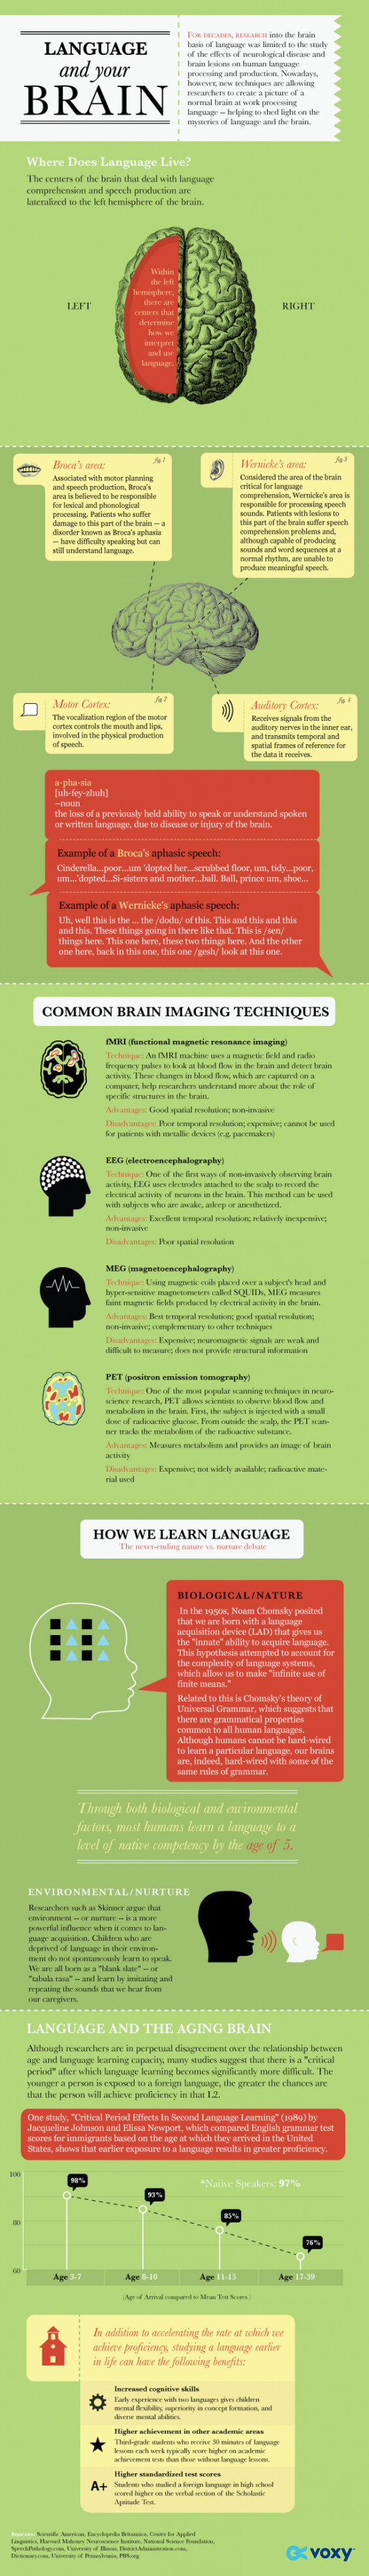 Language_Brain